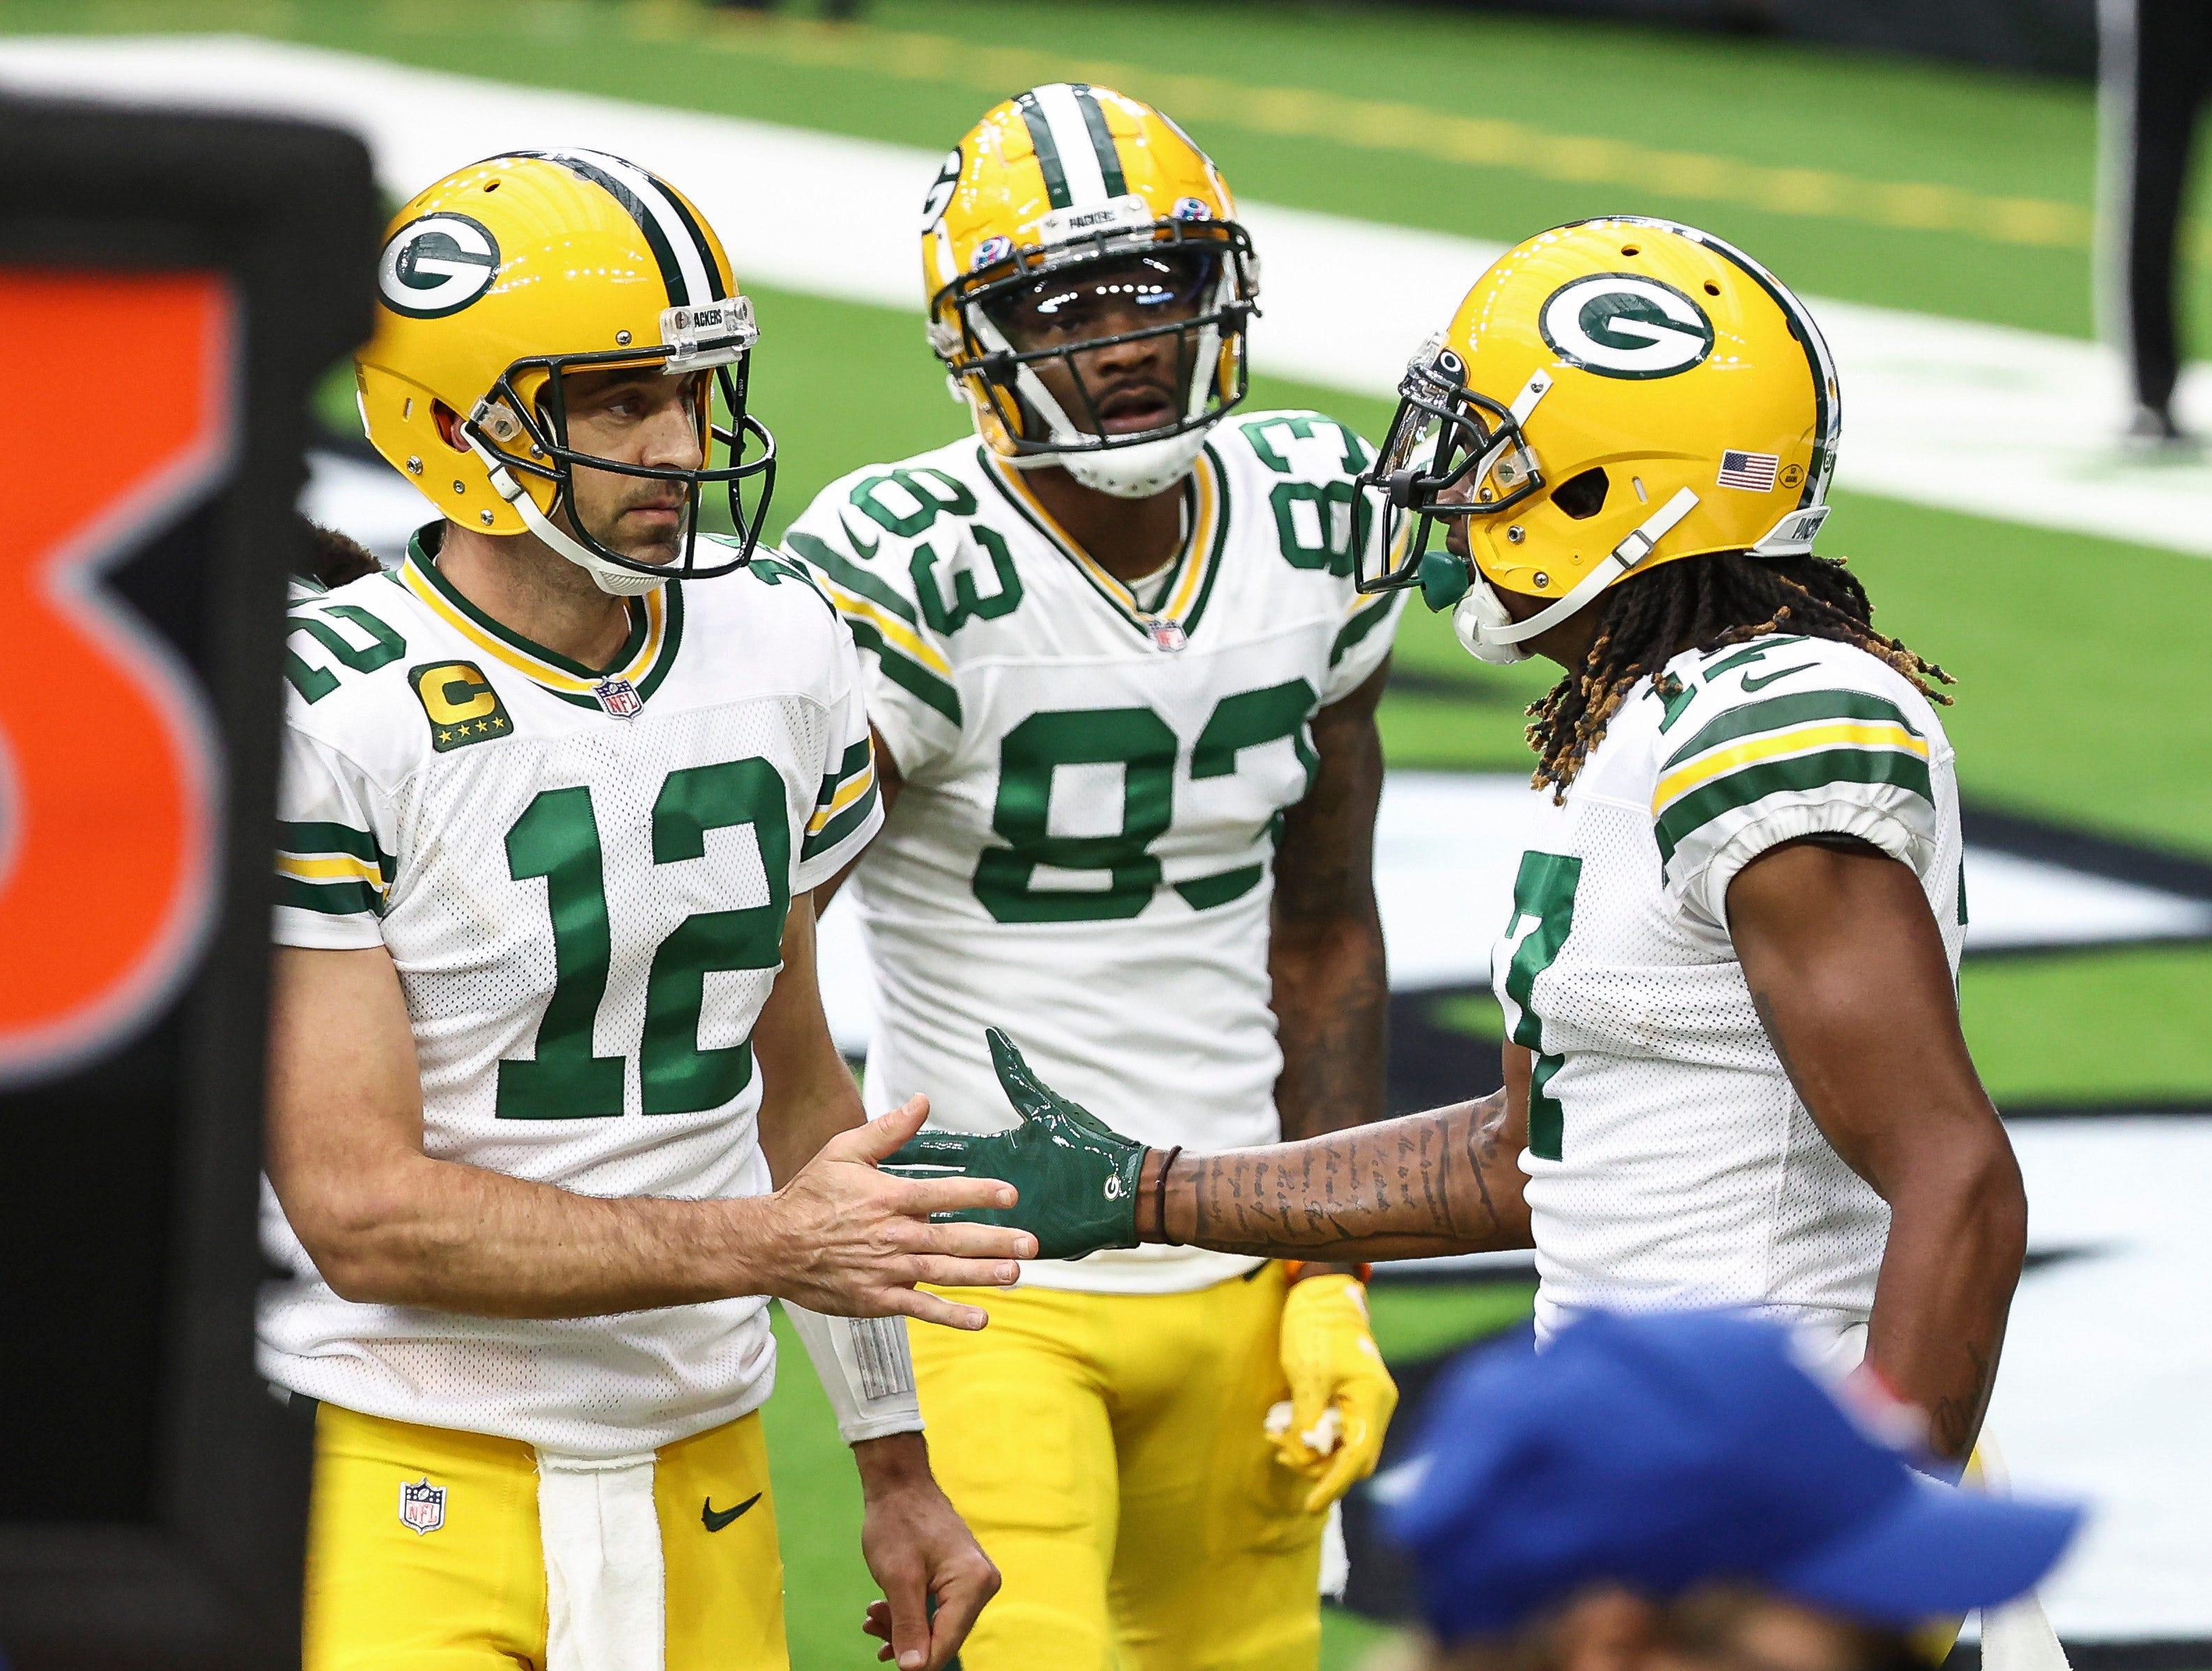 Davante Adams, Aaron Rodgers help Packers bounce back against Texans